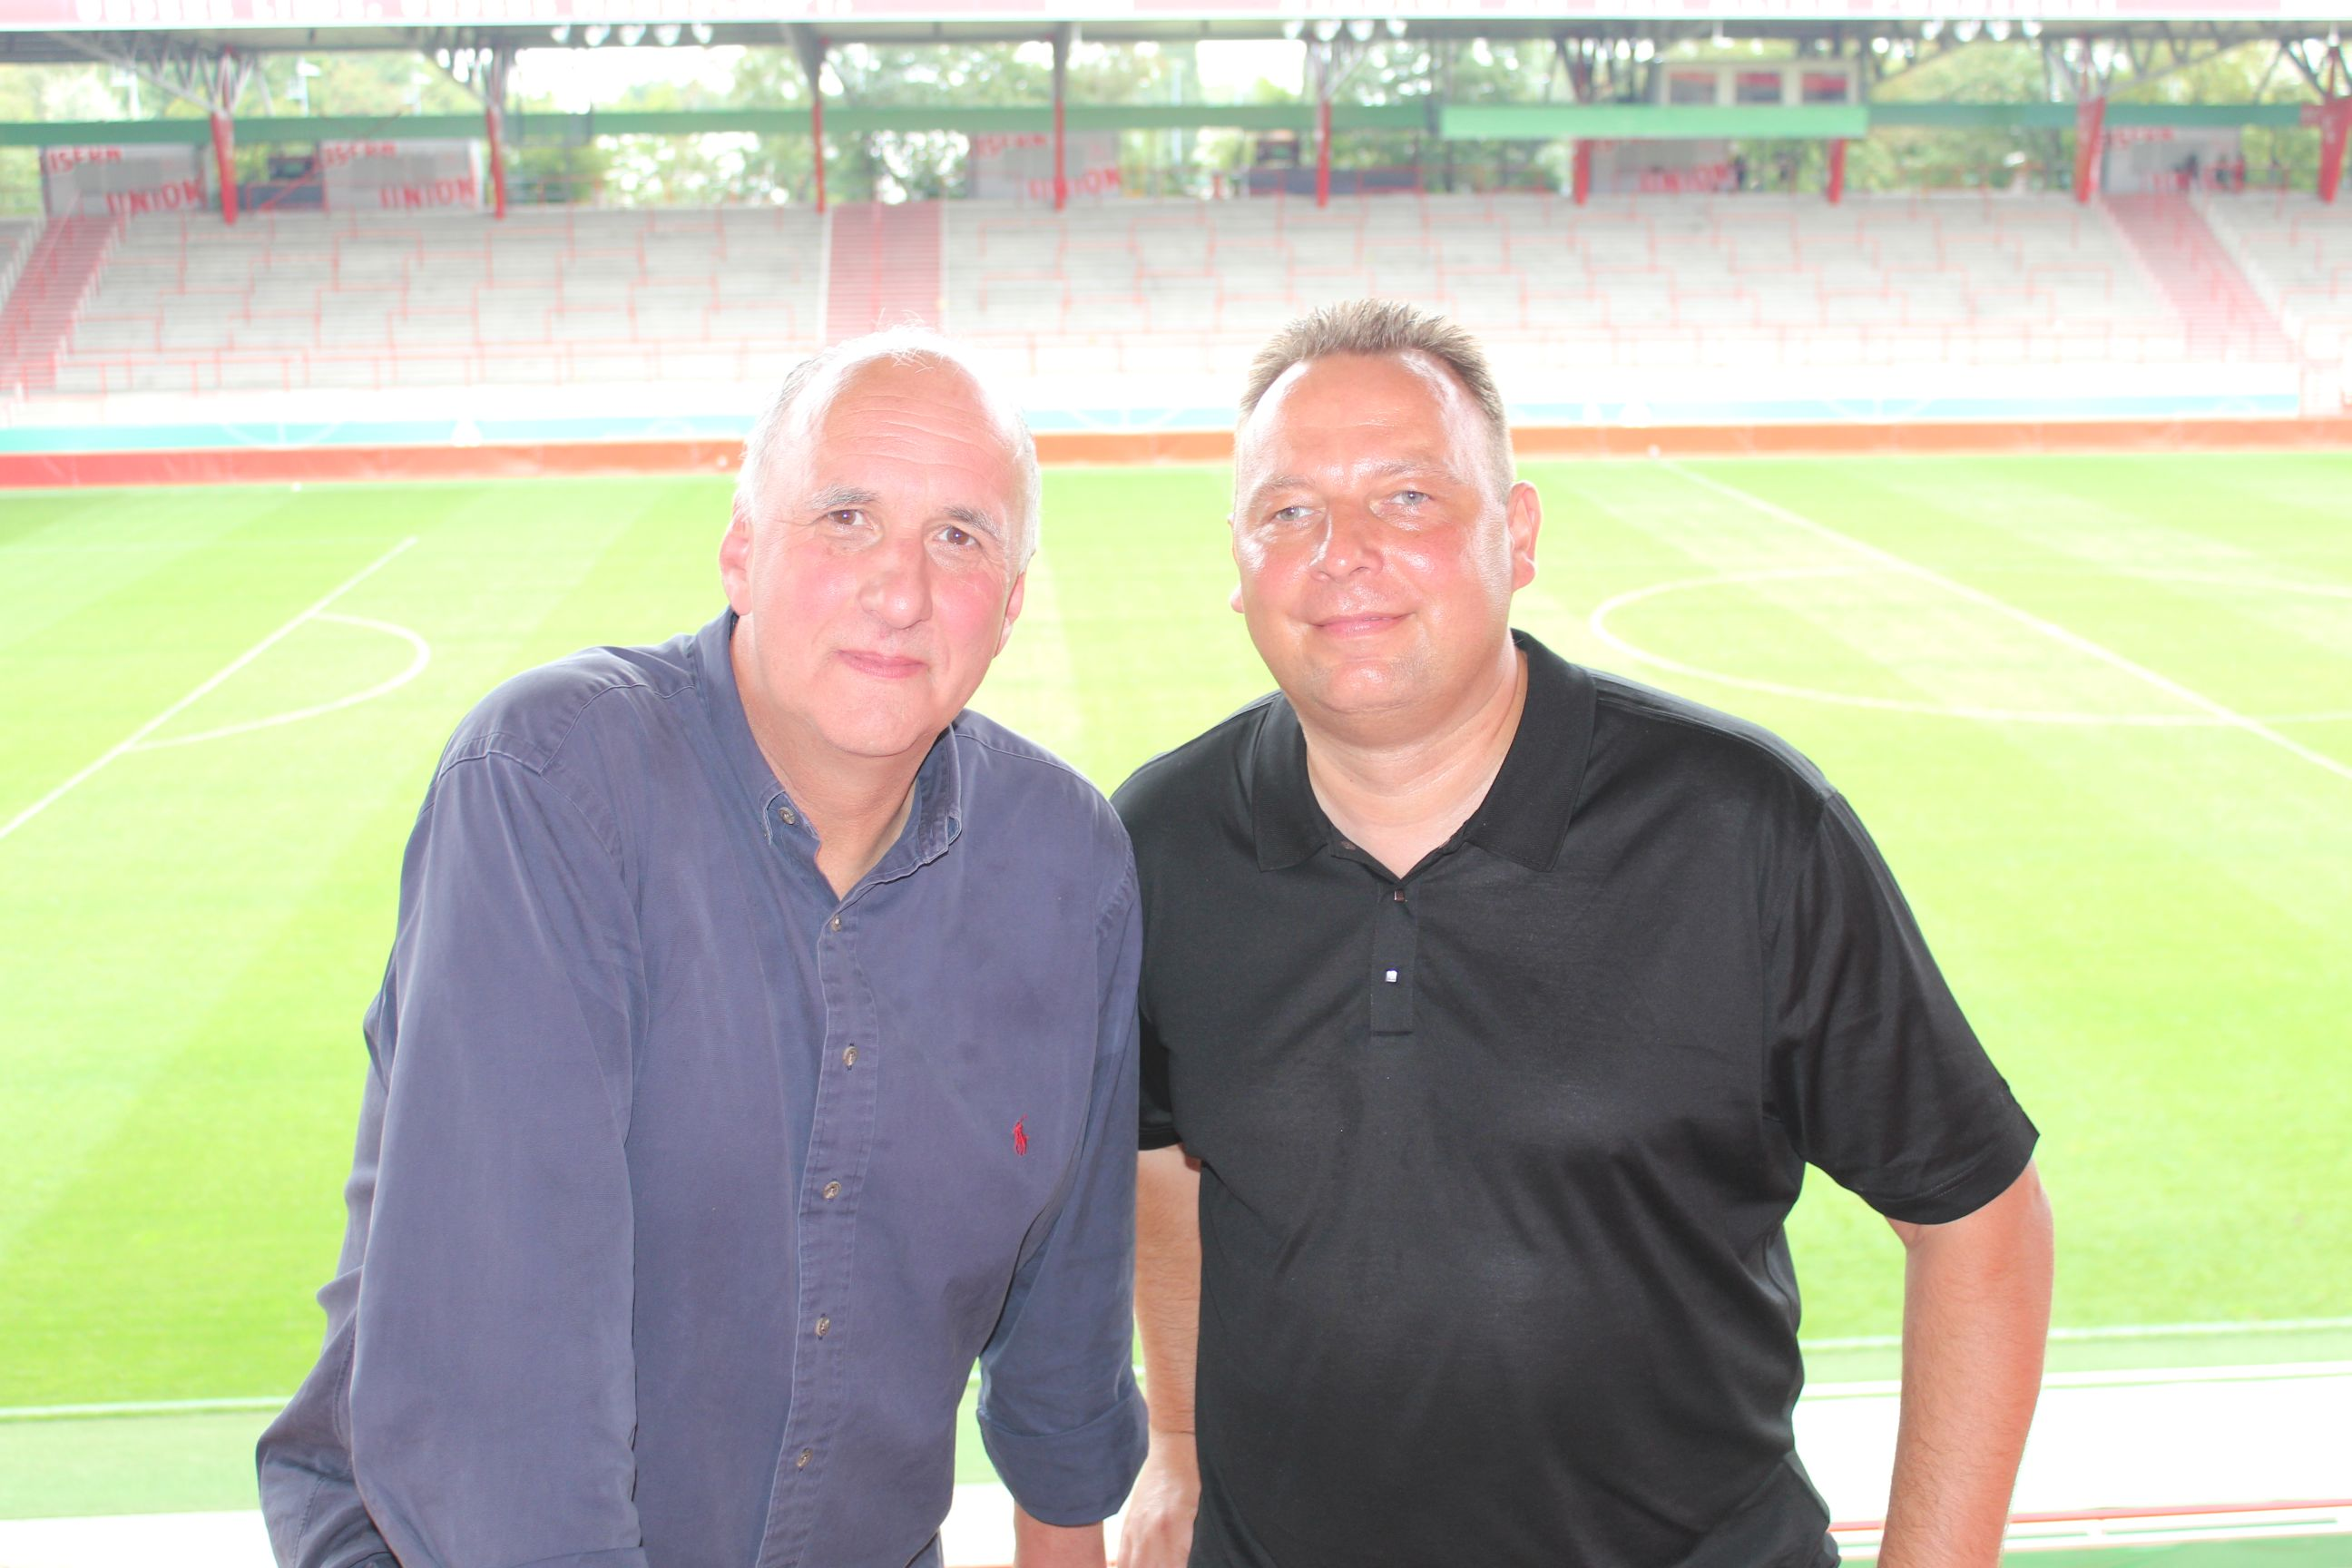 Uwe Utz und Peer Seifert